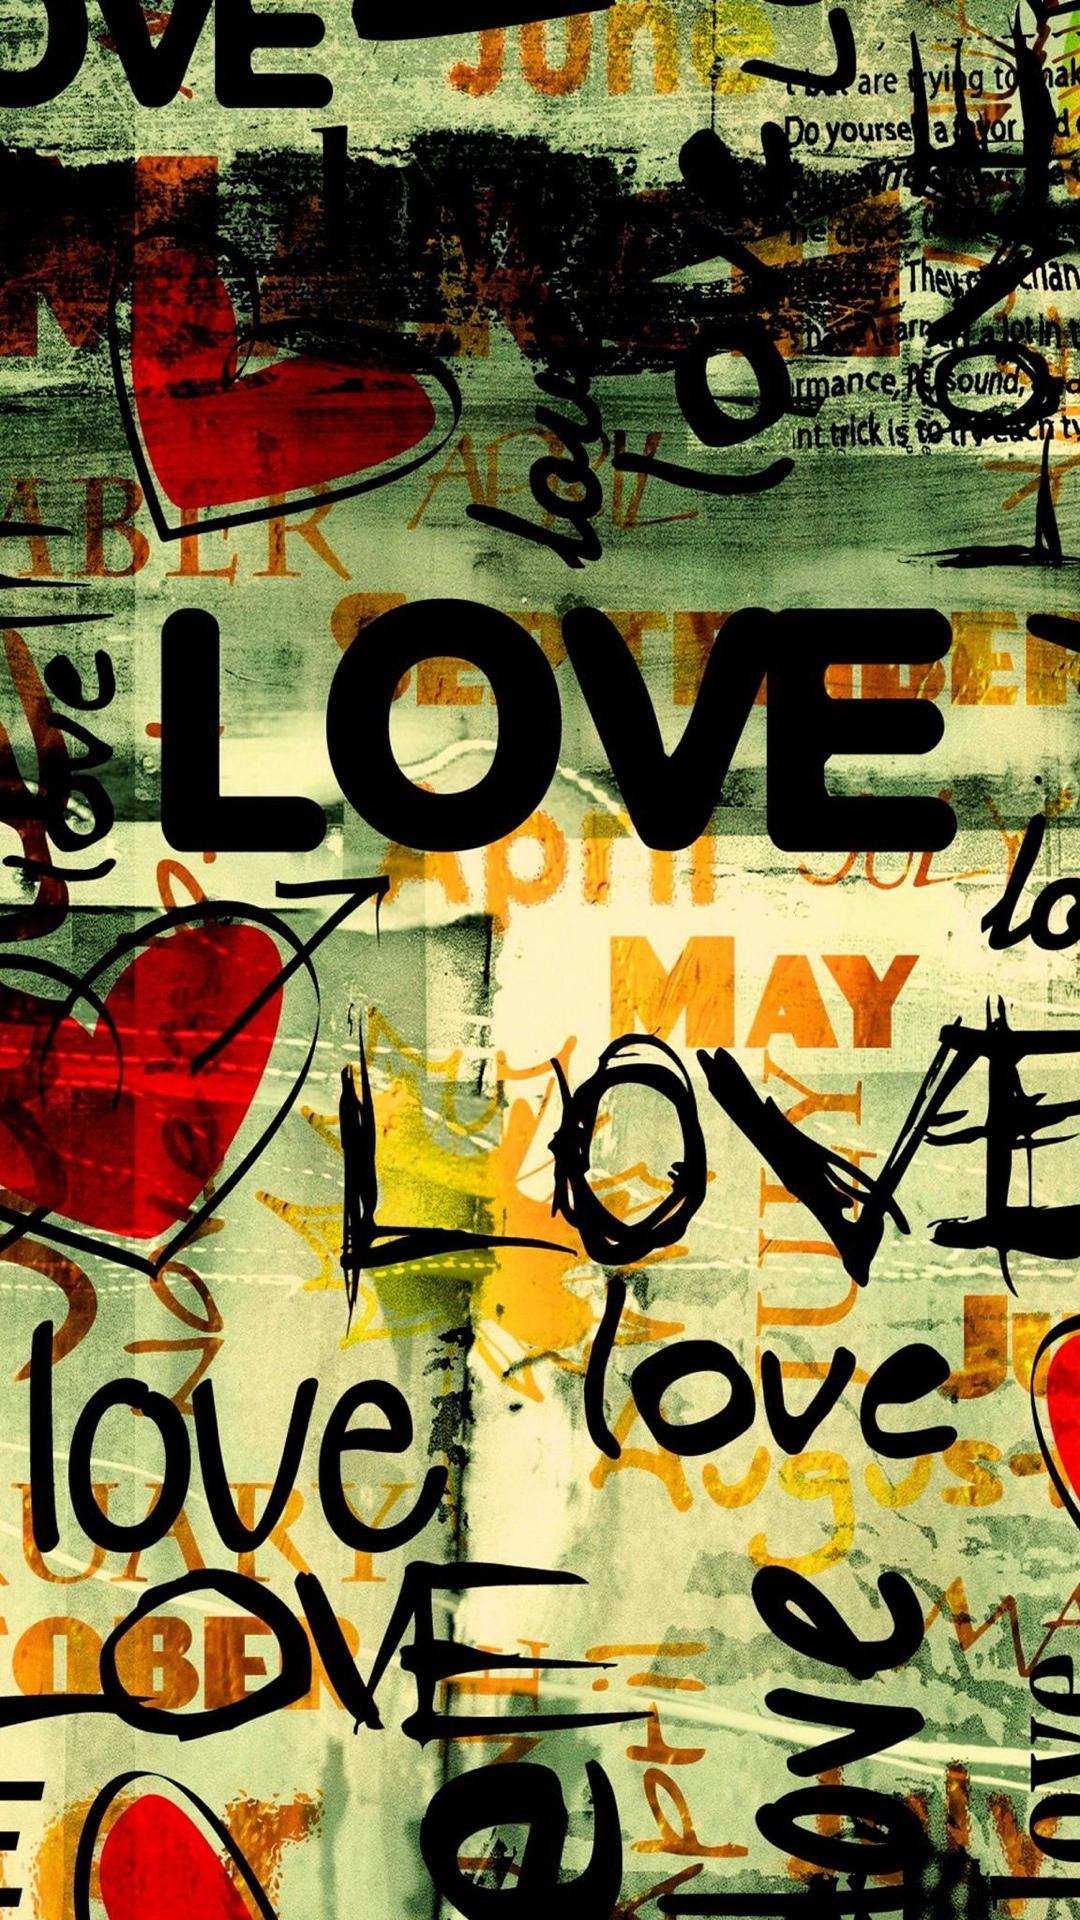 Love Wallpaper For S4 : Galaxy S4 Quotes Wallpaper HD Wallpaper